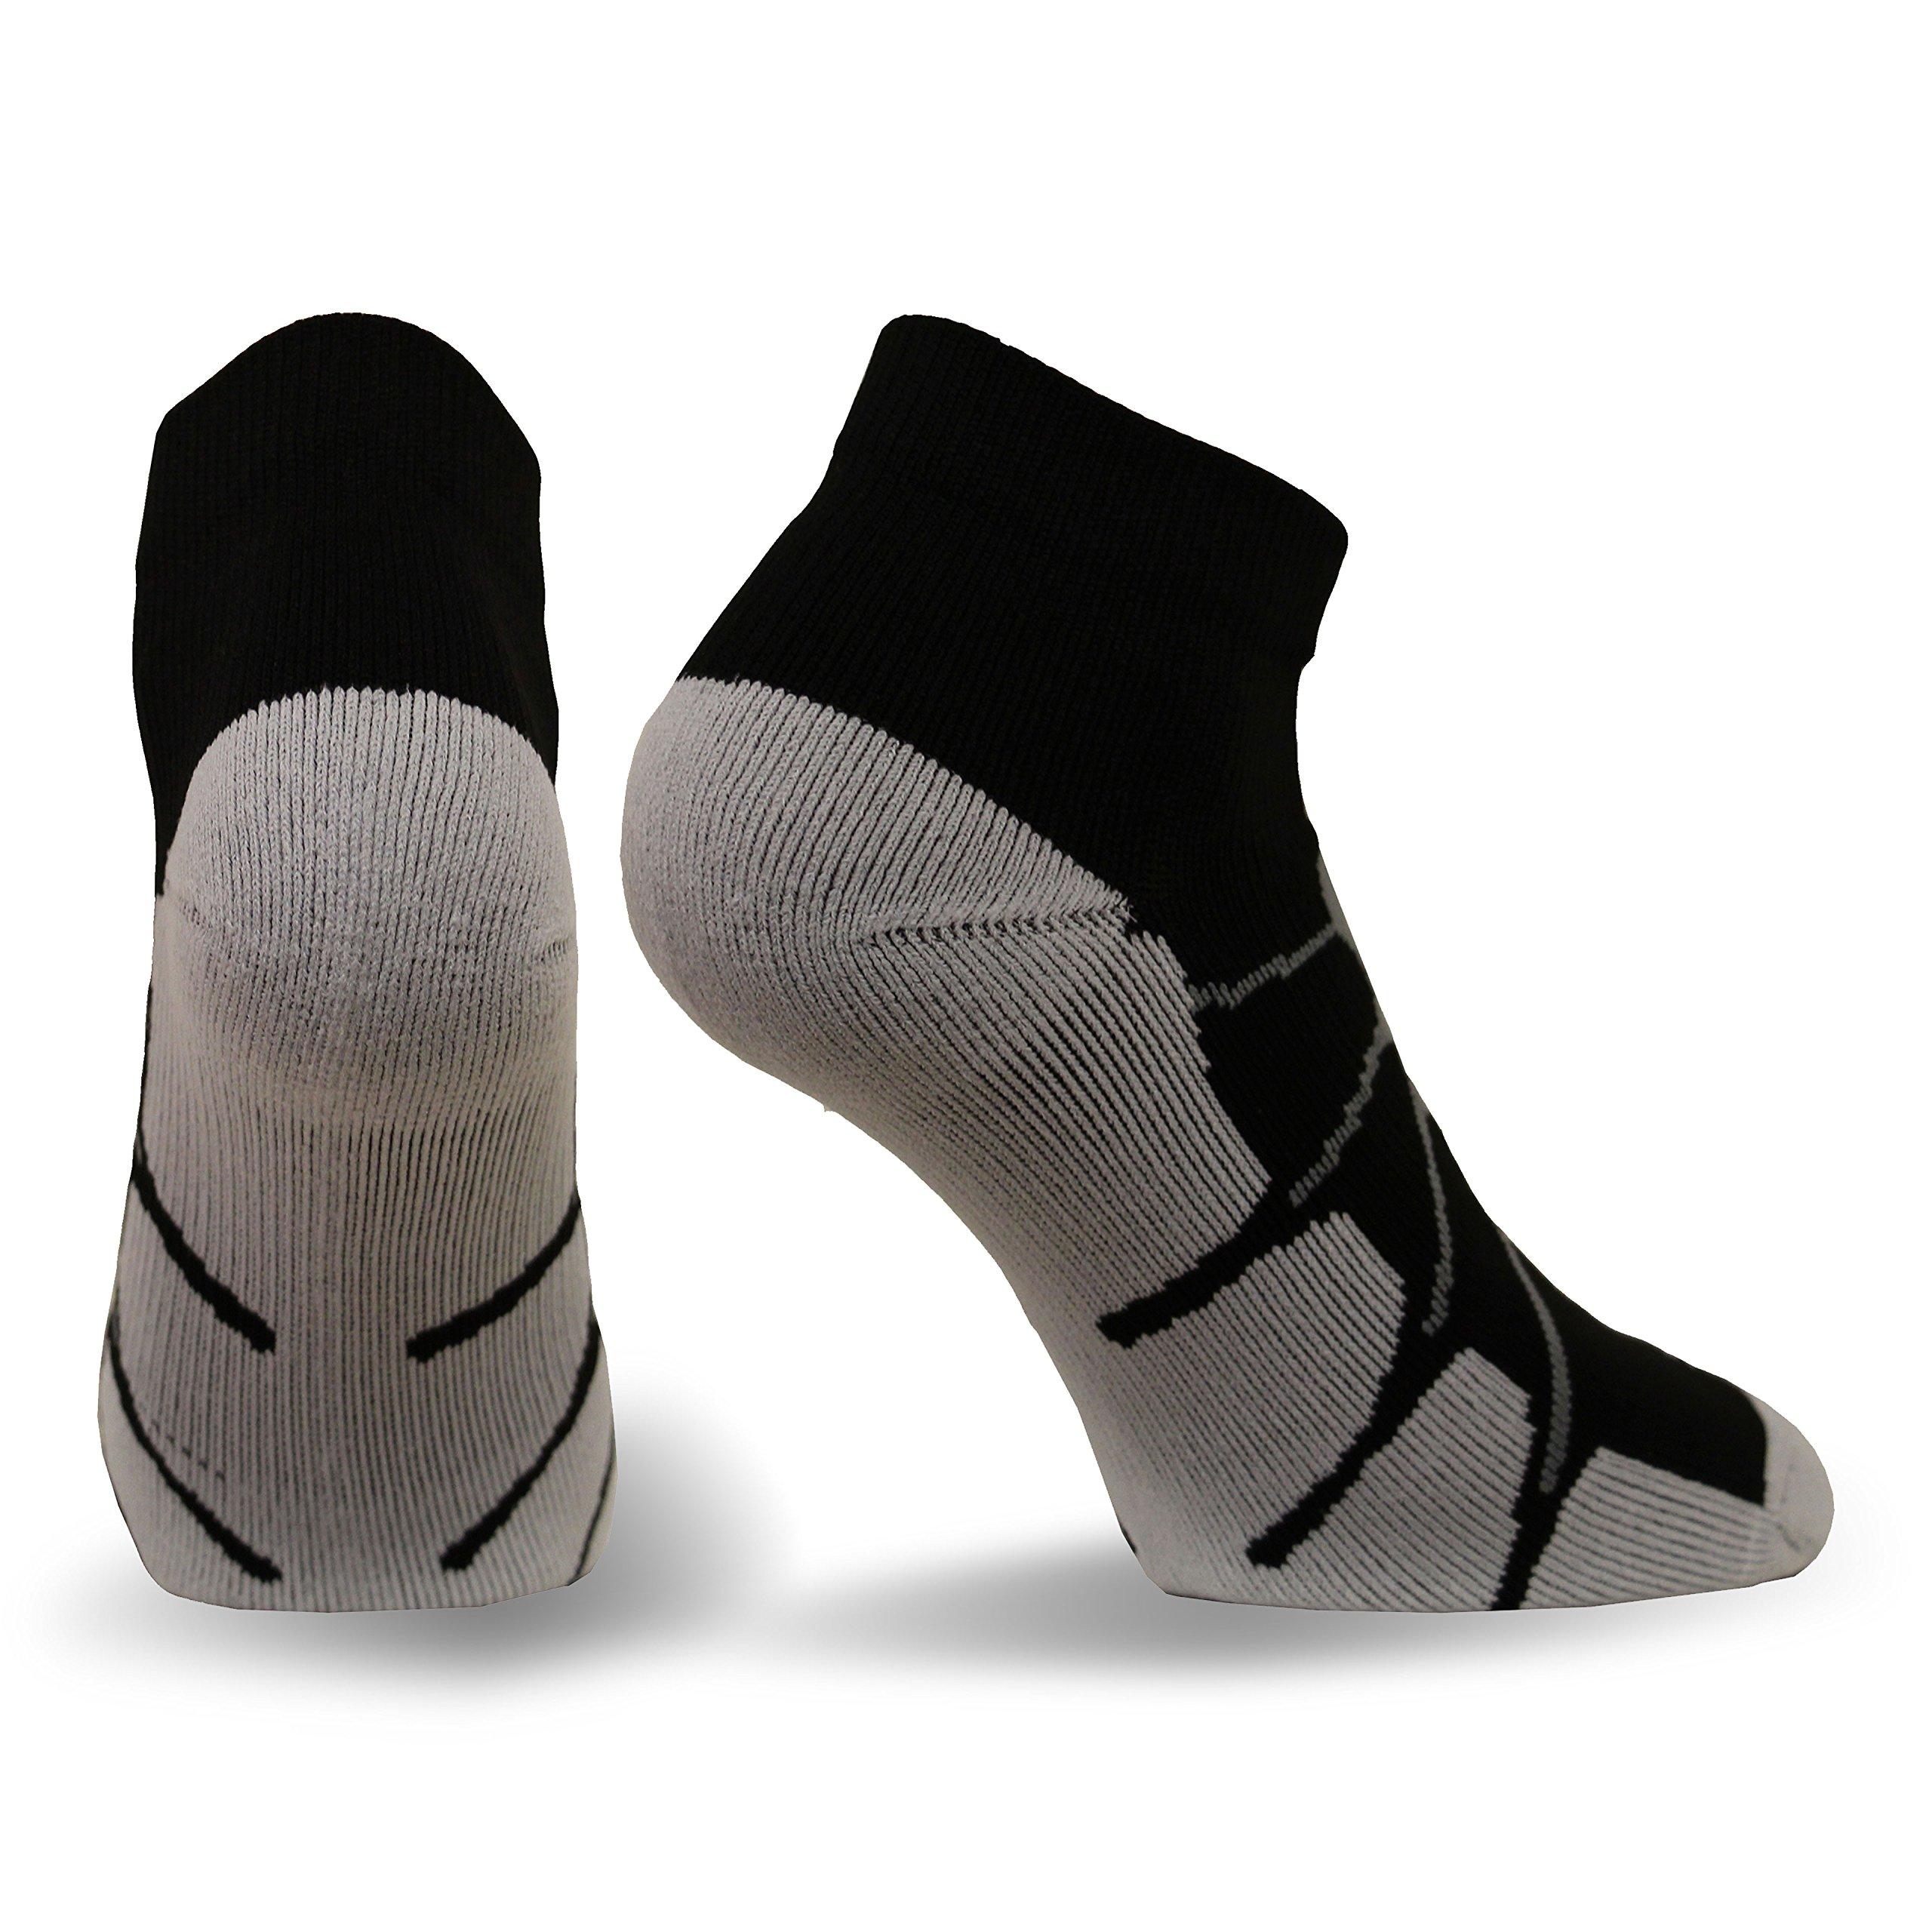 Sox MultiSport Plantar Fasciitus Ped Compression Socks